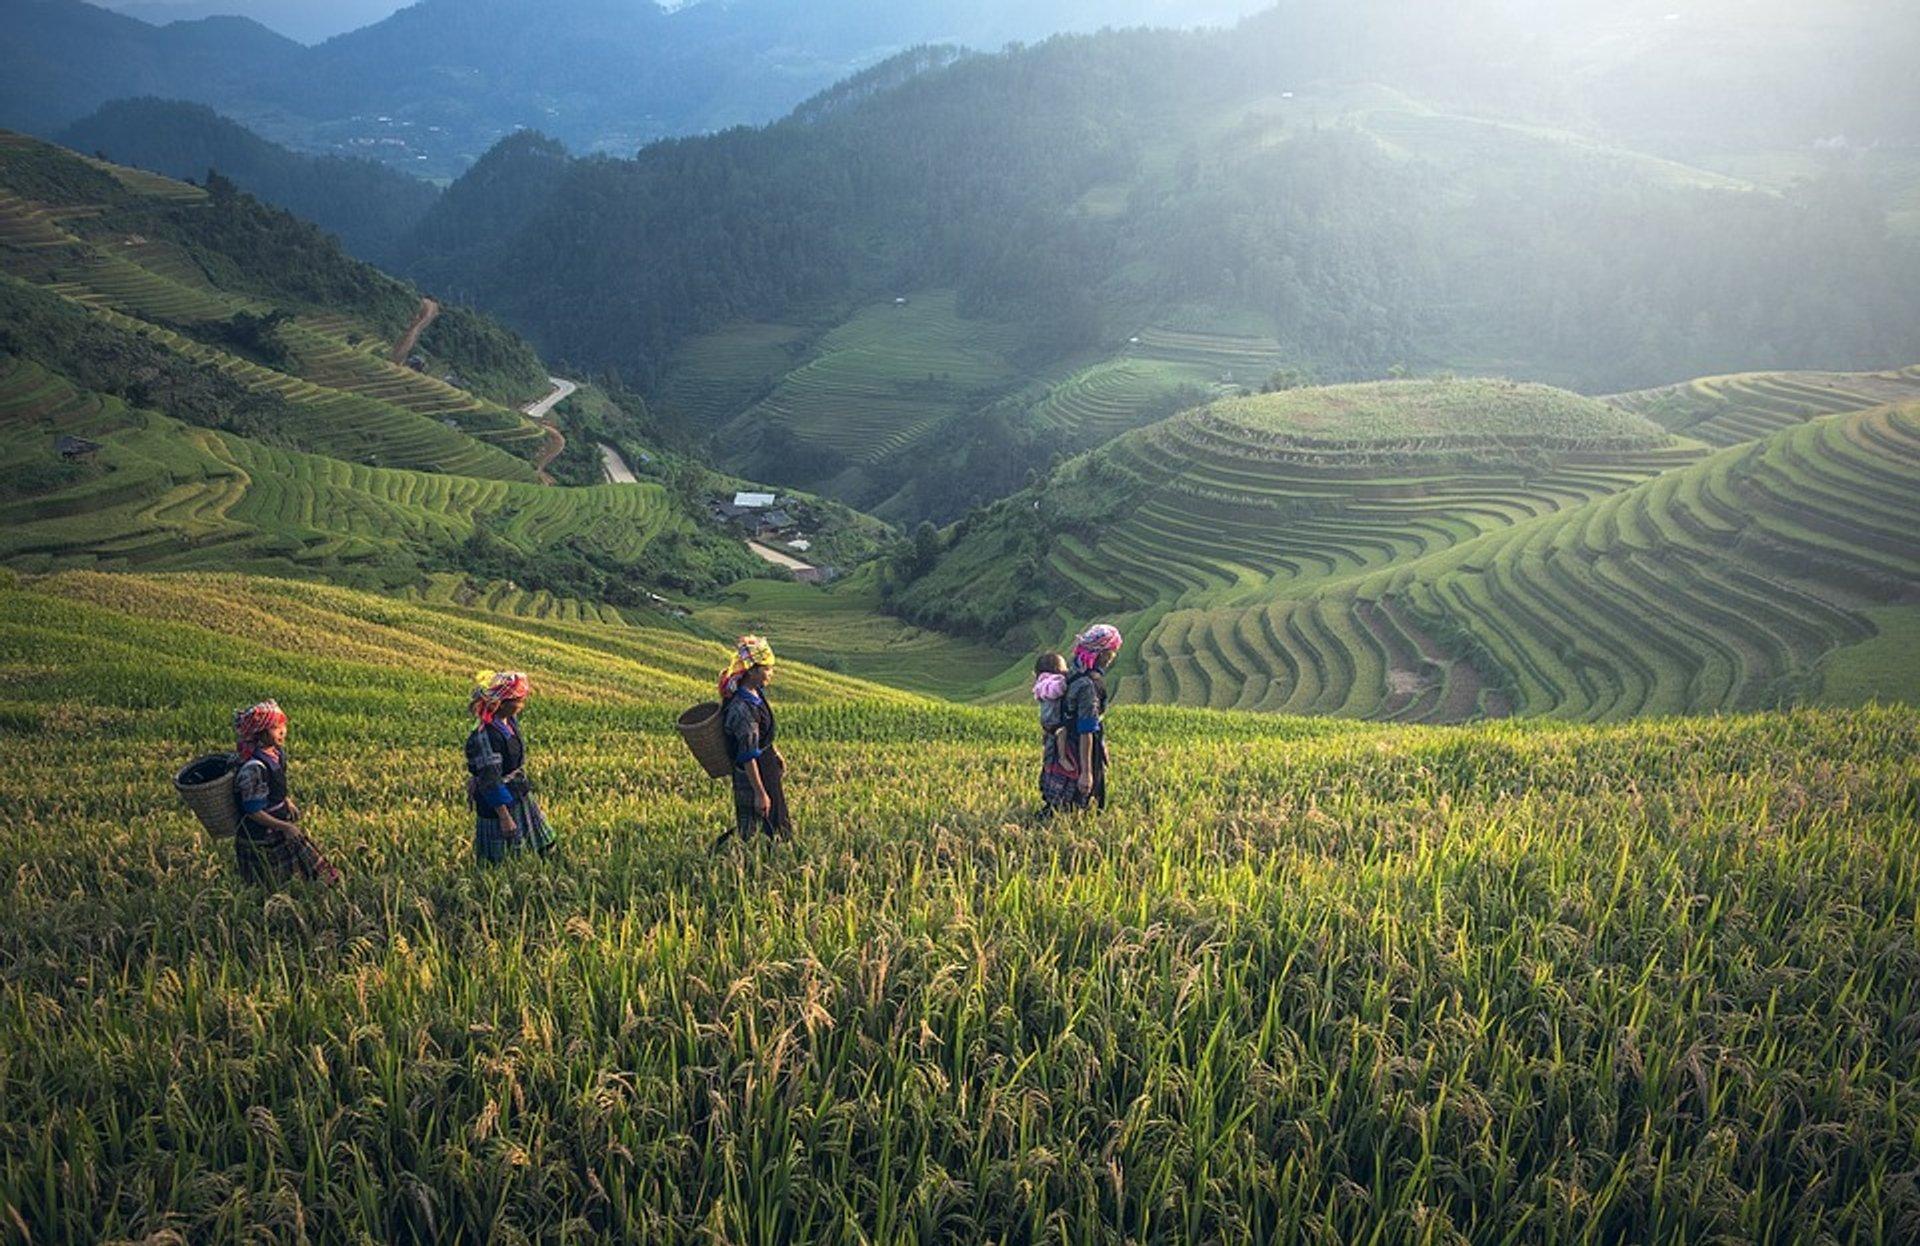 Rice Harvest in Myanmar 2019 - Best Time